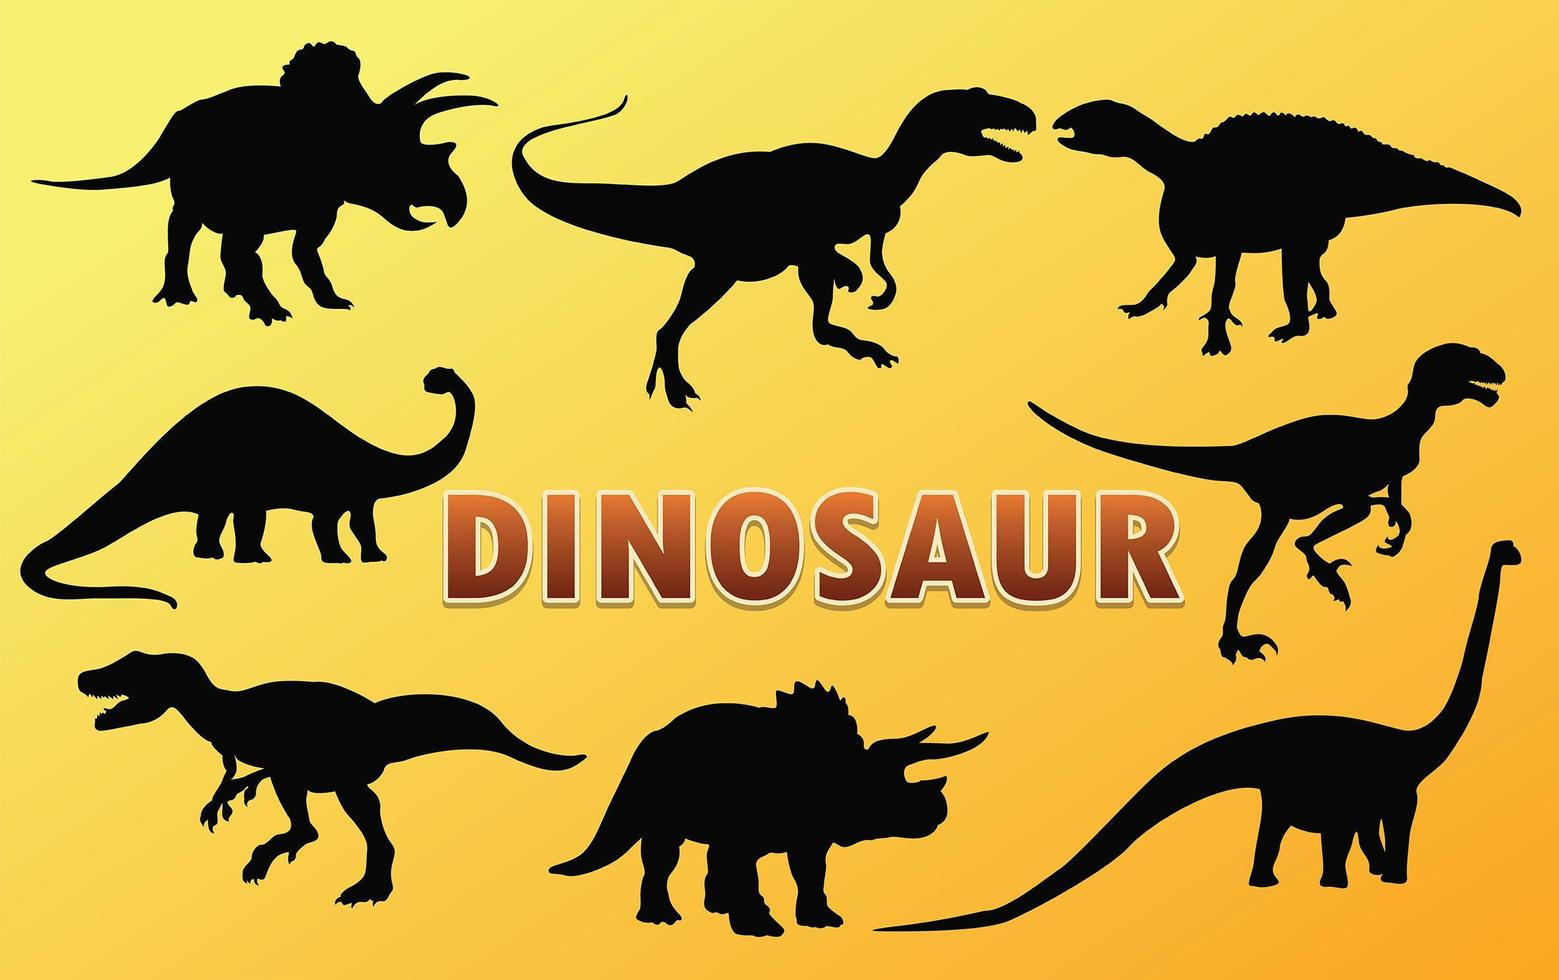 dinosaurie silhuett vektor design.